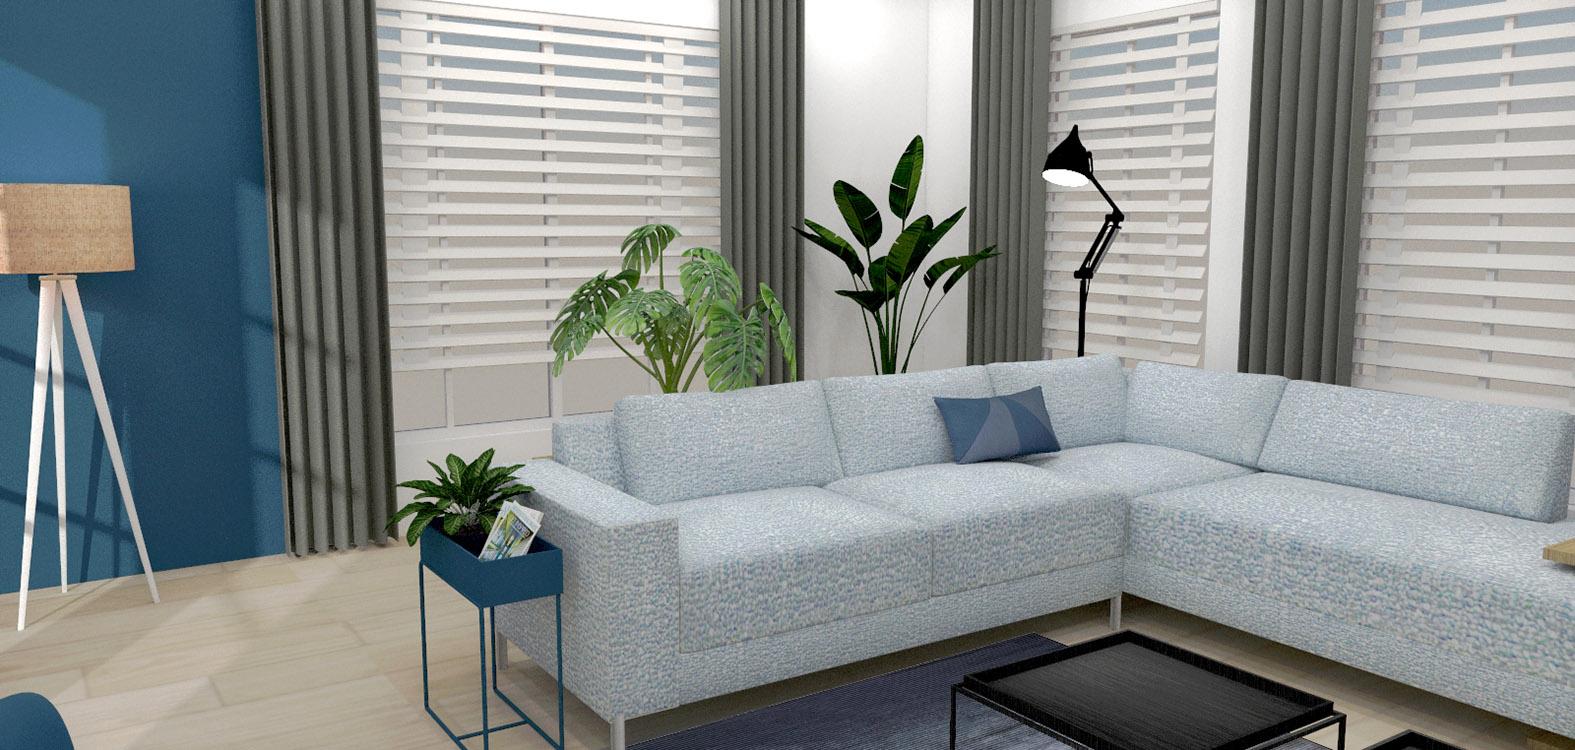 Huiskamer interieuradvies binnenhuisarchitectuur drunen elshout styling 3d visualisatie 2